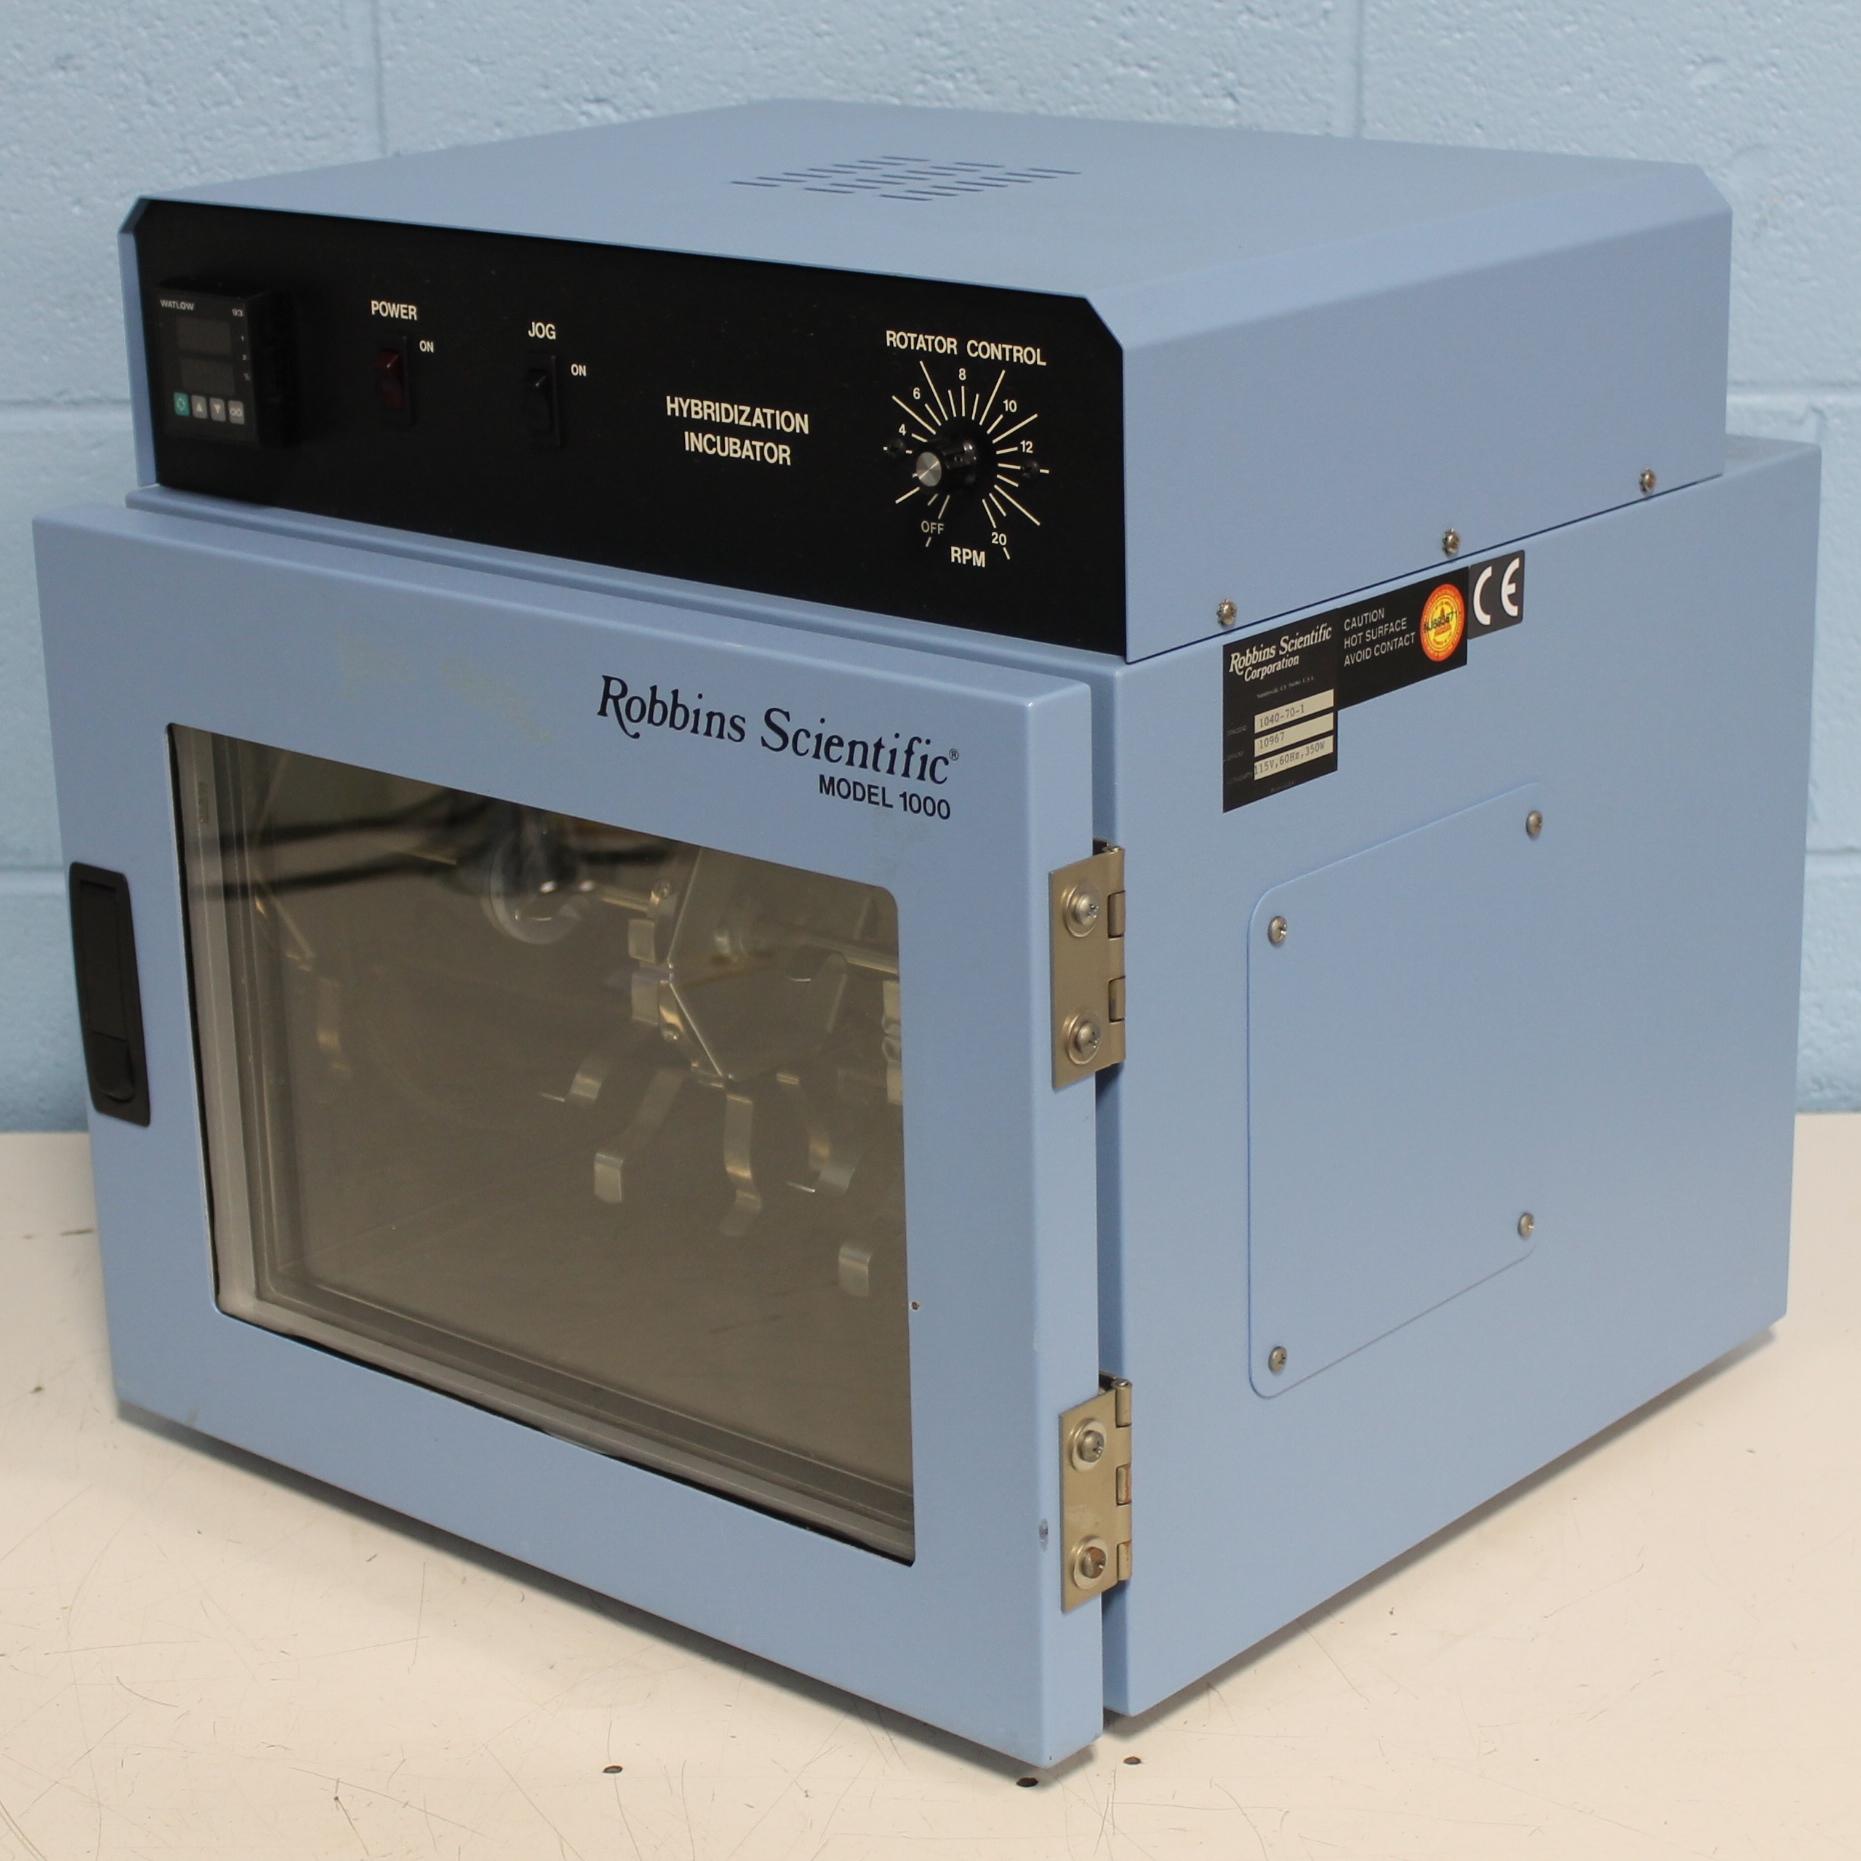 Robbins Scientific 1000 Hybridization Incubator Image